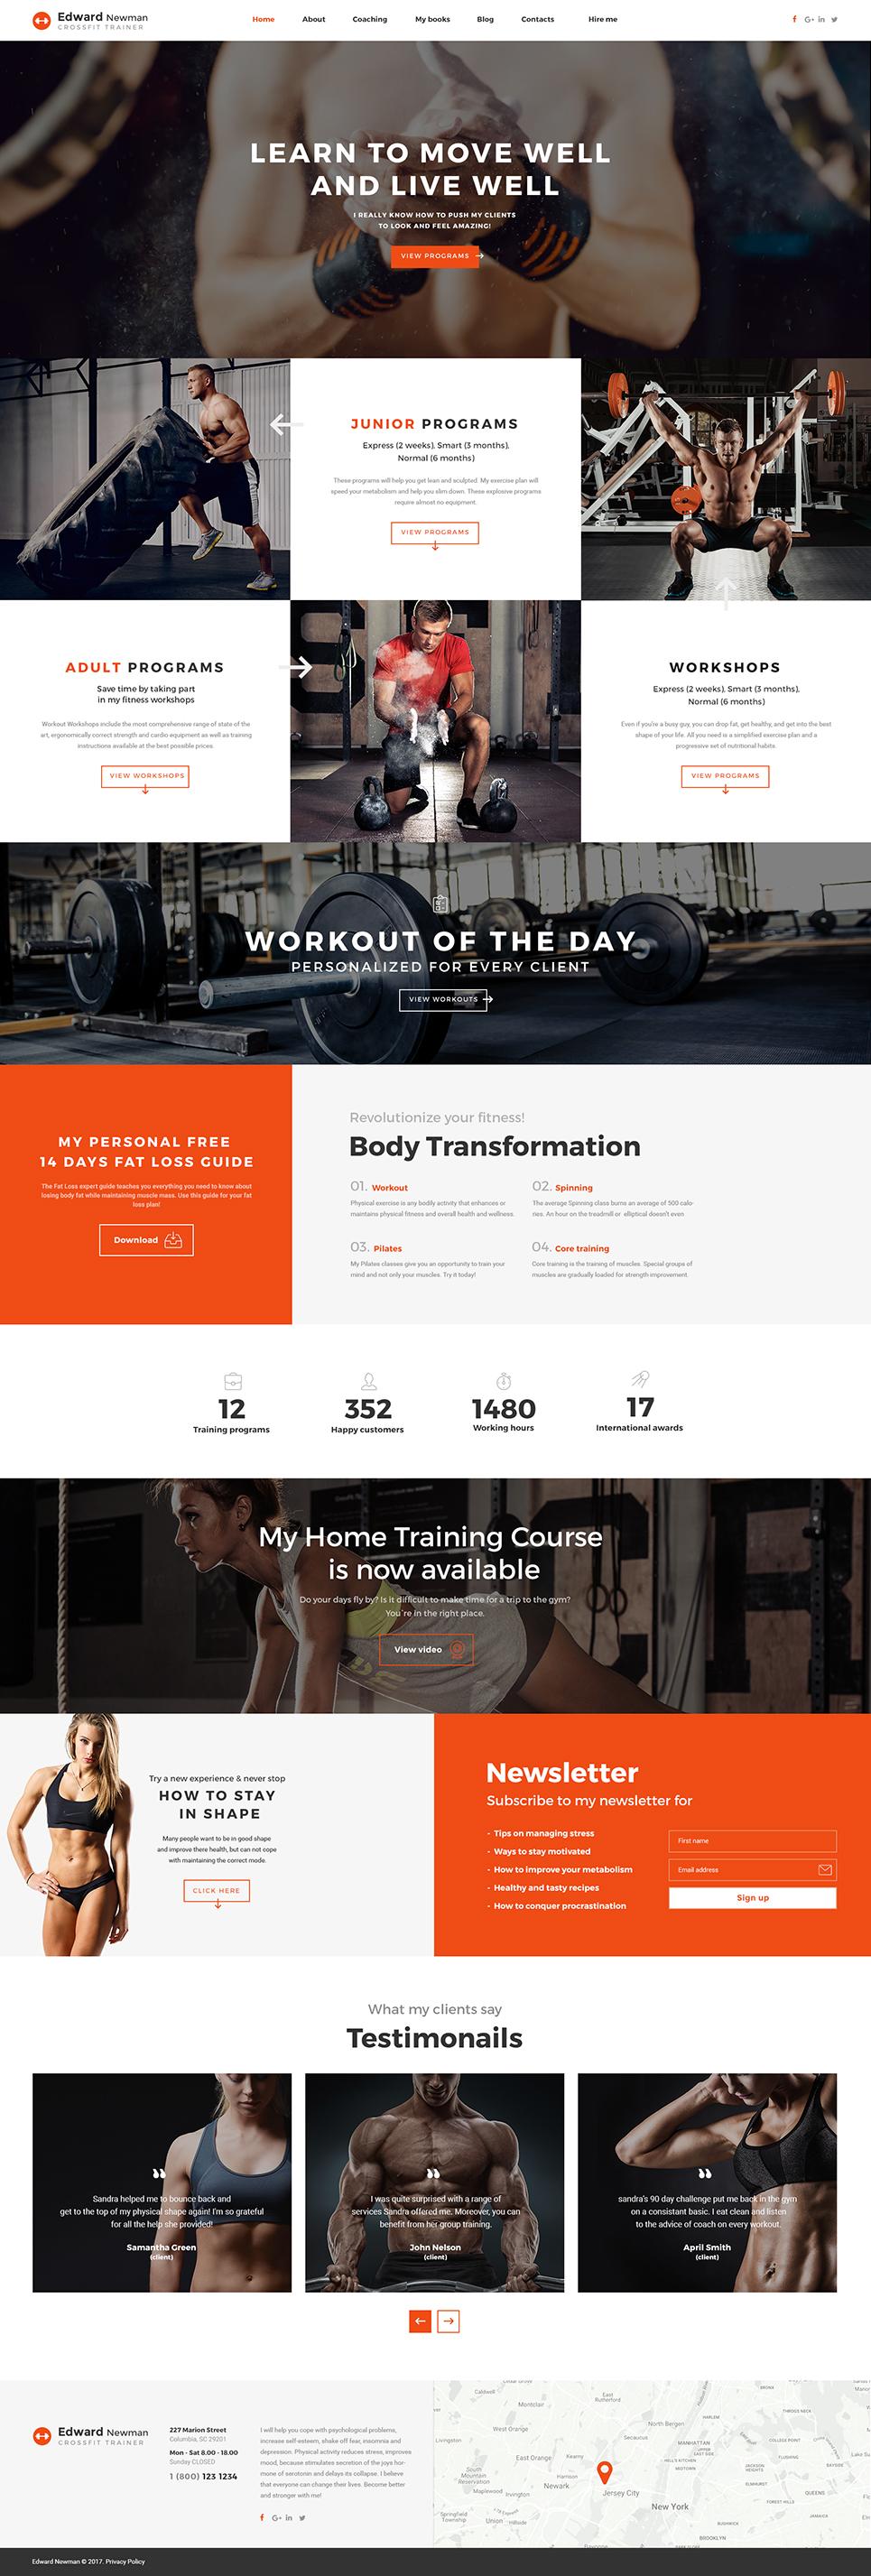 Reszponzív Edward Newman - Crossfit Trainer Multipage Weboldal sablon 62182